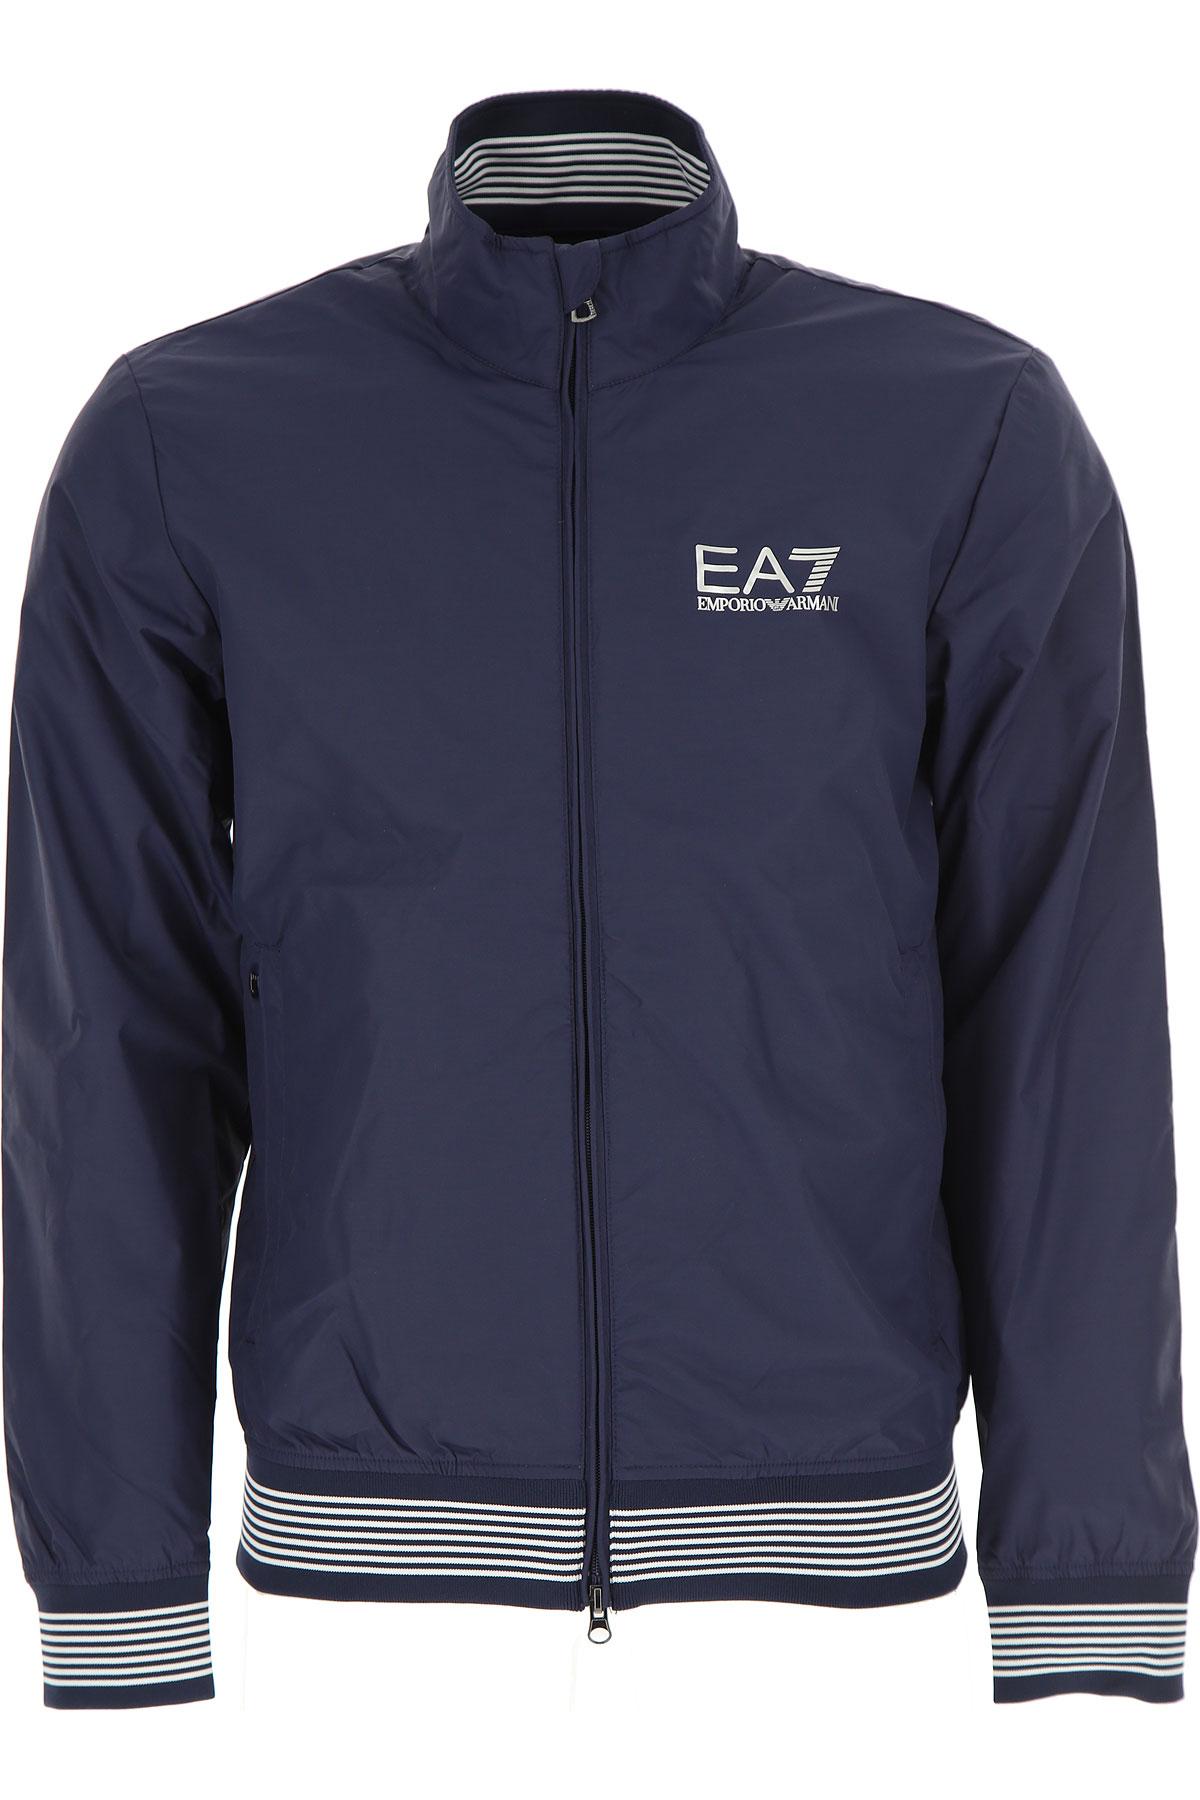 Emporio Armani Jacket for Men On Sale, Blue Navy, polyamide, 2017, L M XL XXL USA-449823